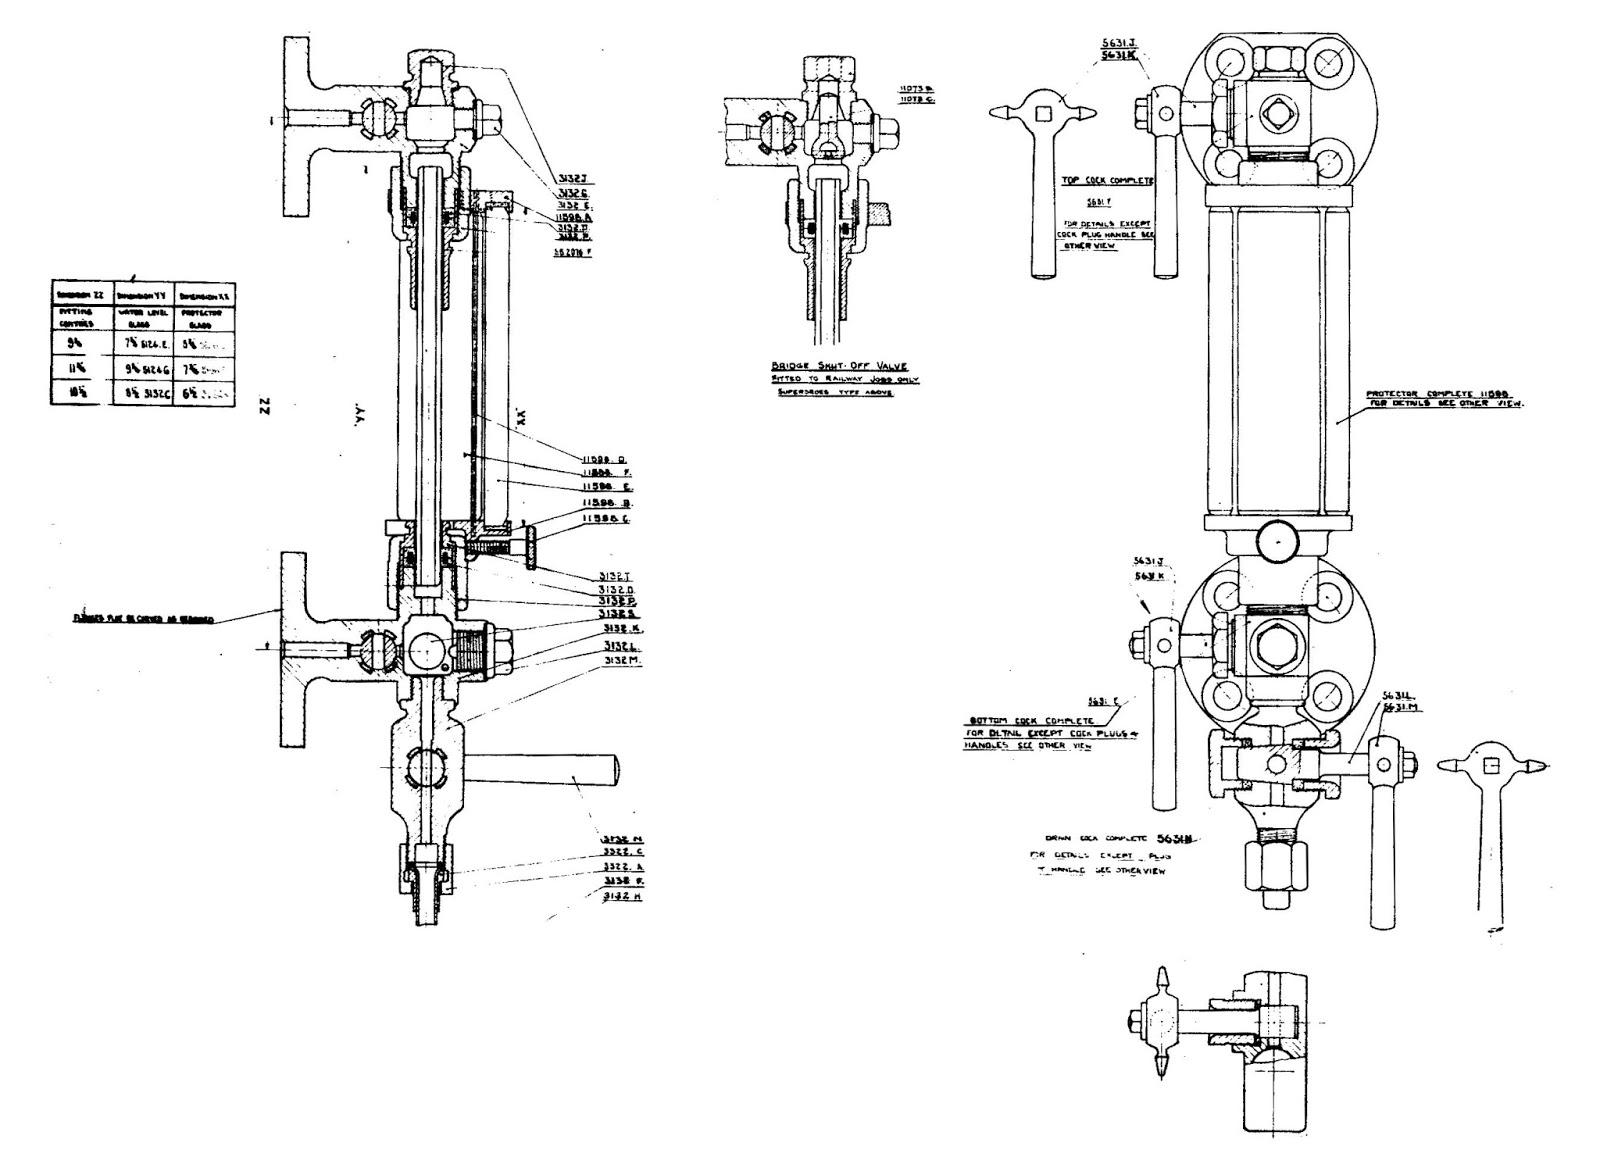 parts of a steam locomotive diagram